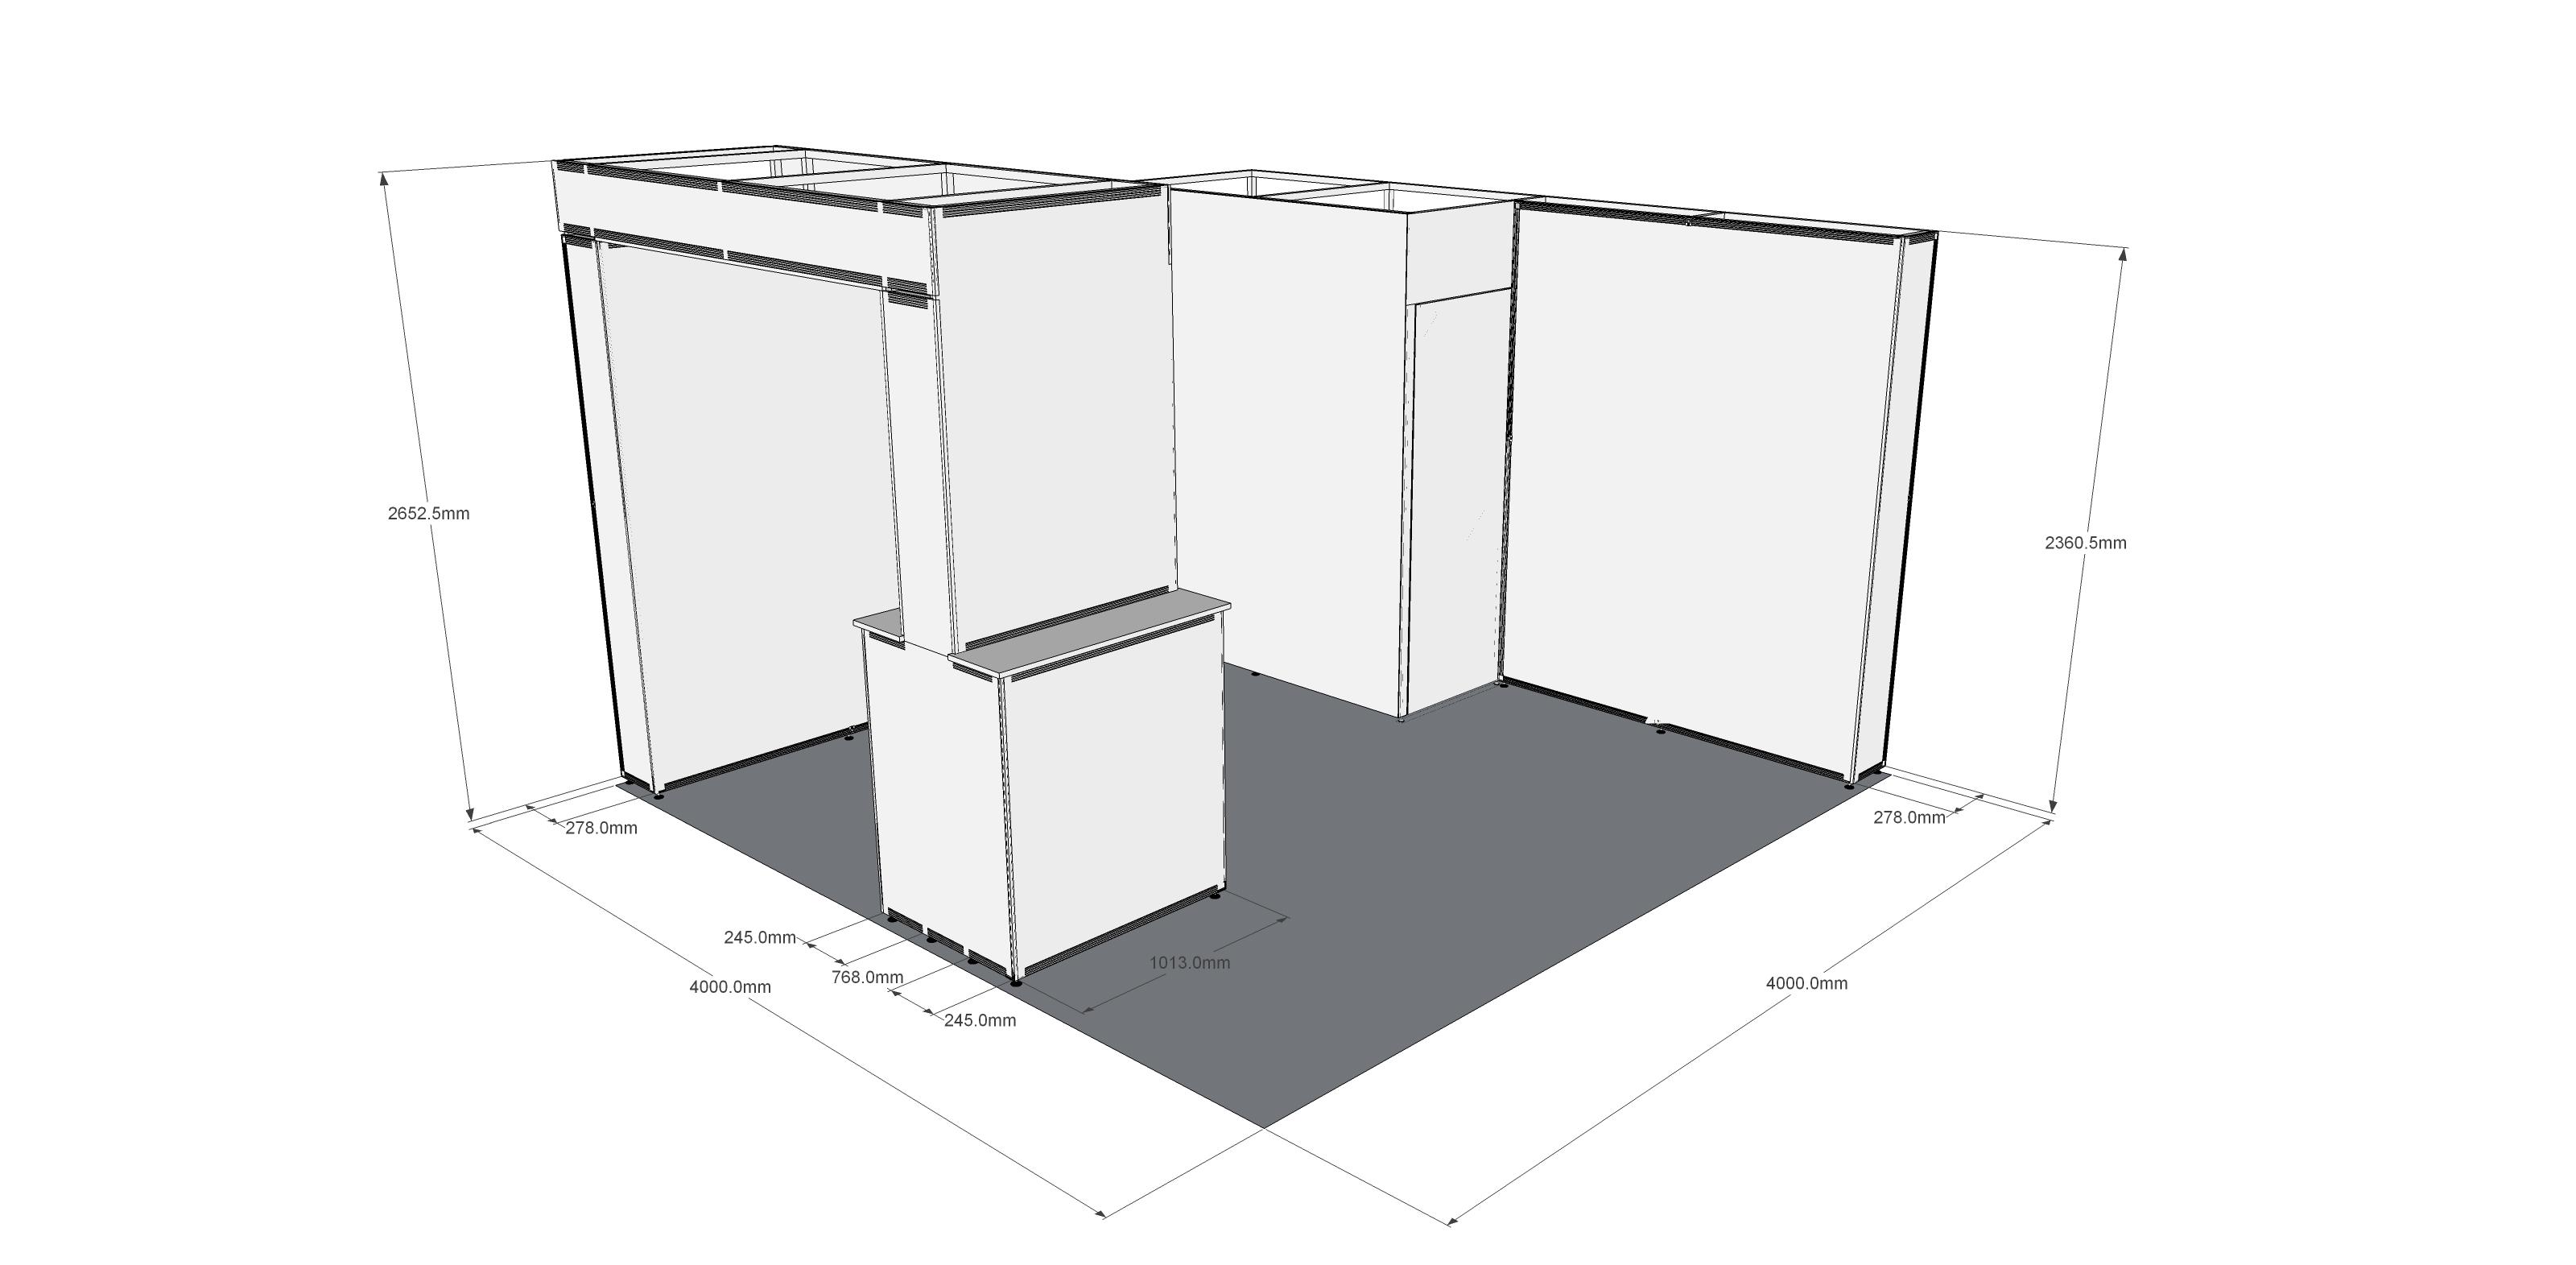 Exhibition Stand Designer Vacancy : Bespoke stands ebiss uk ebiss uk